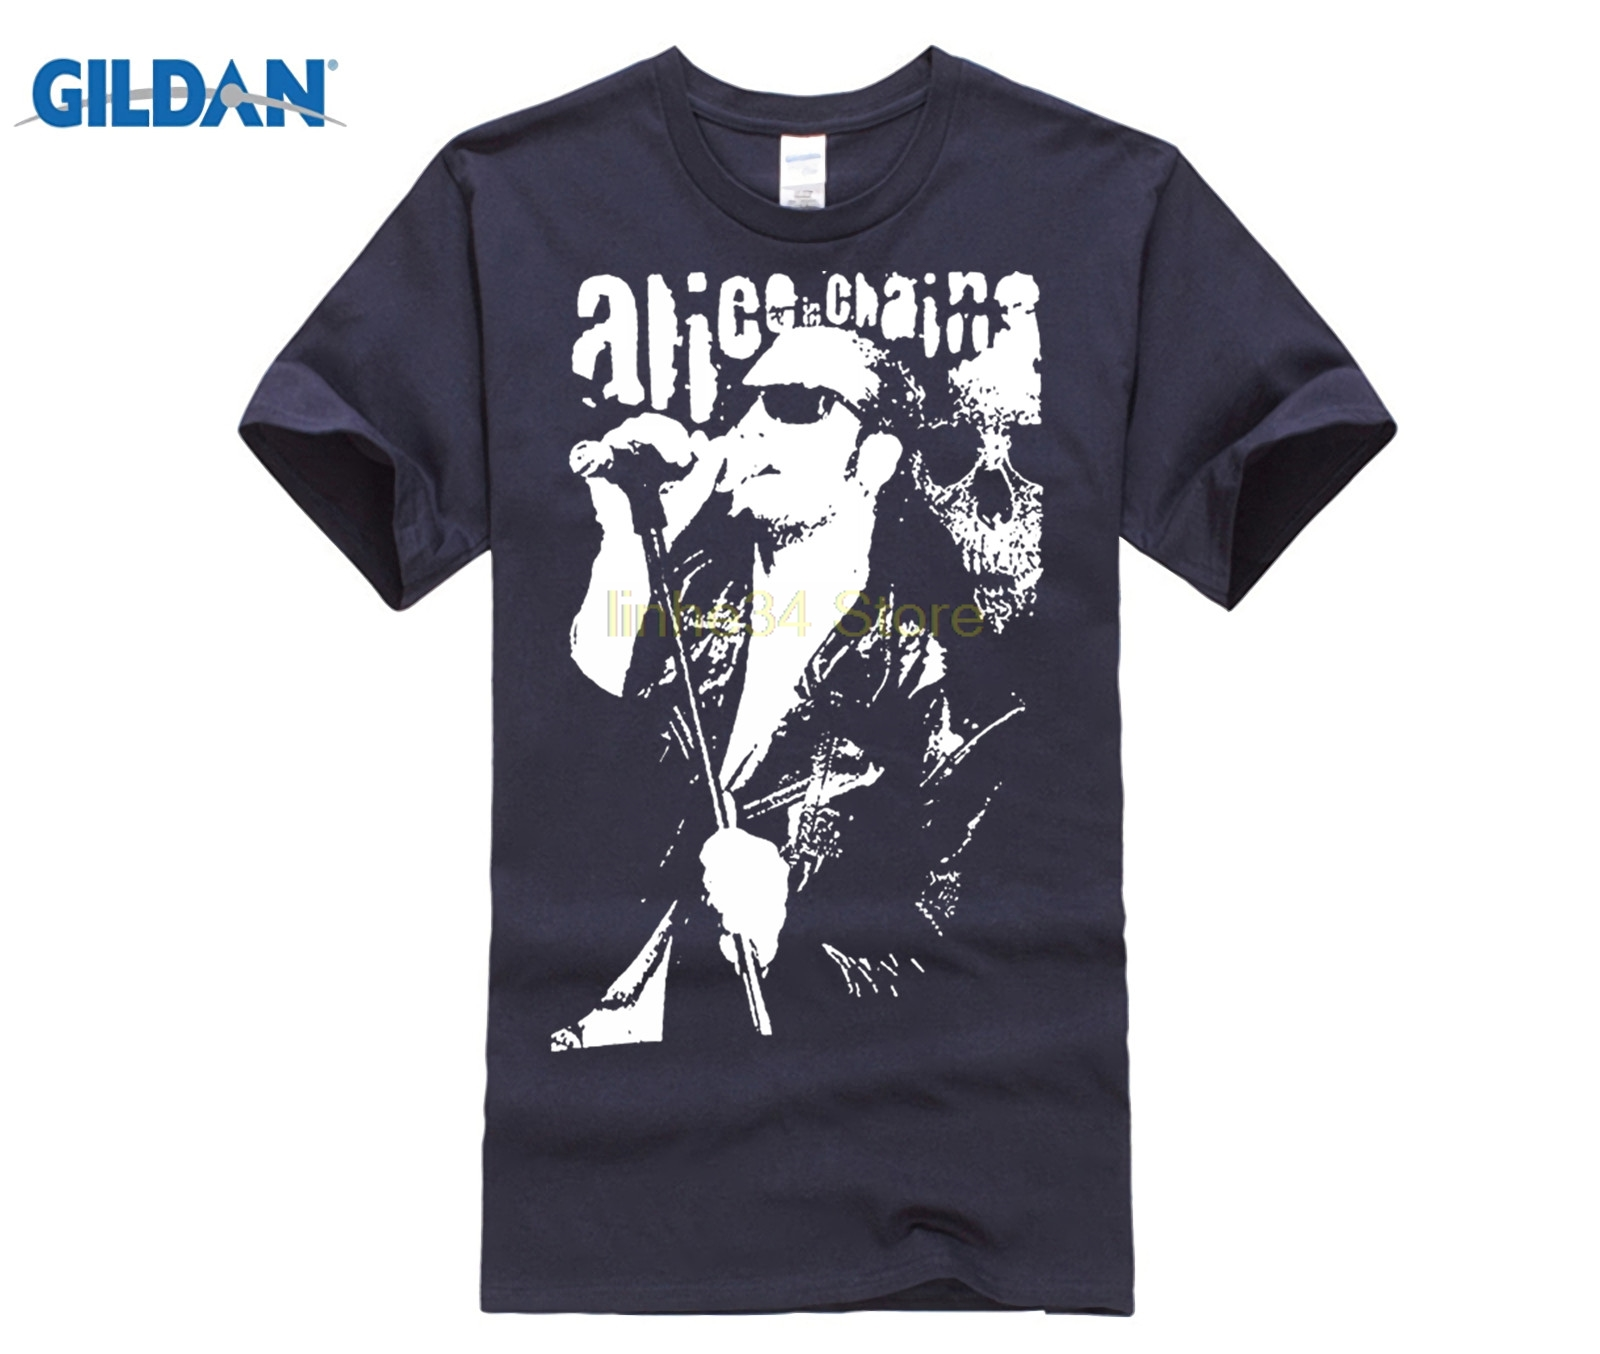 New 2017 Fashion T Shirt Men Cinxon Men Alice In Chains Layne Staley Short Tee Shirt Humor Tee Shirt 100% Cotton Tops Graphic